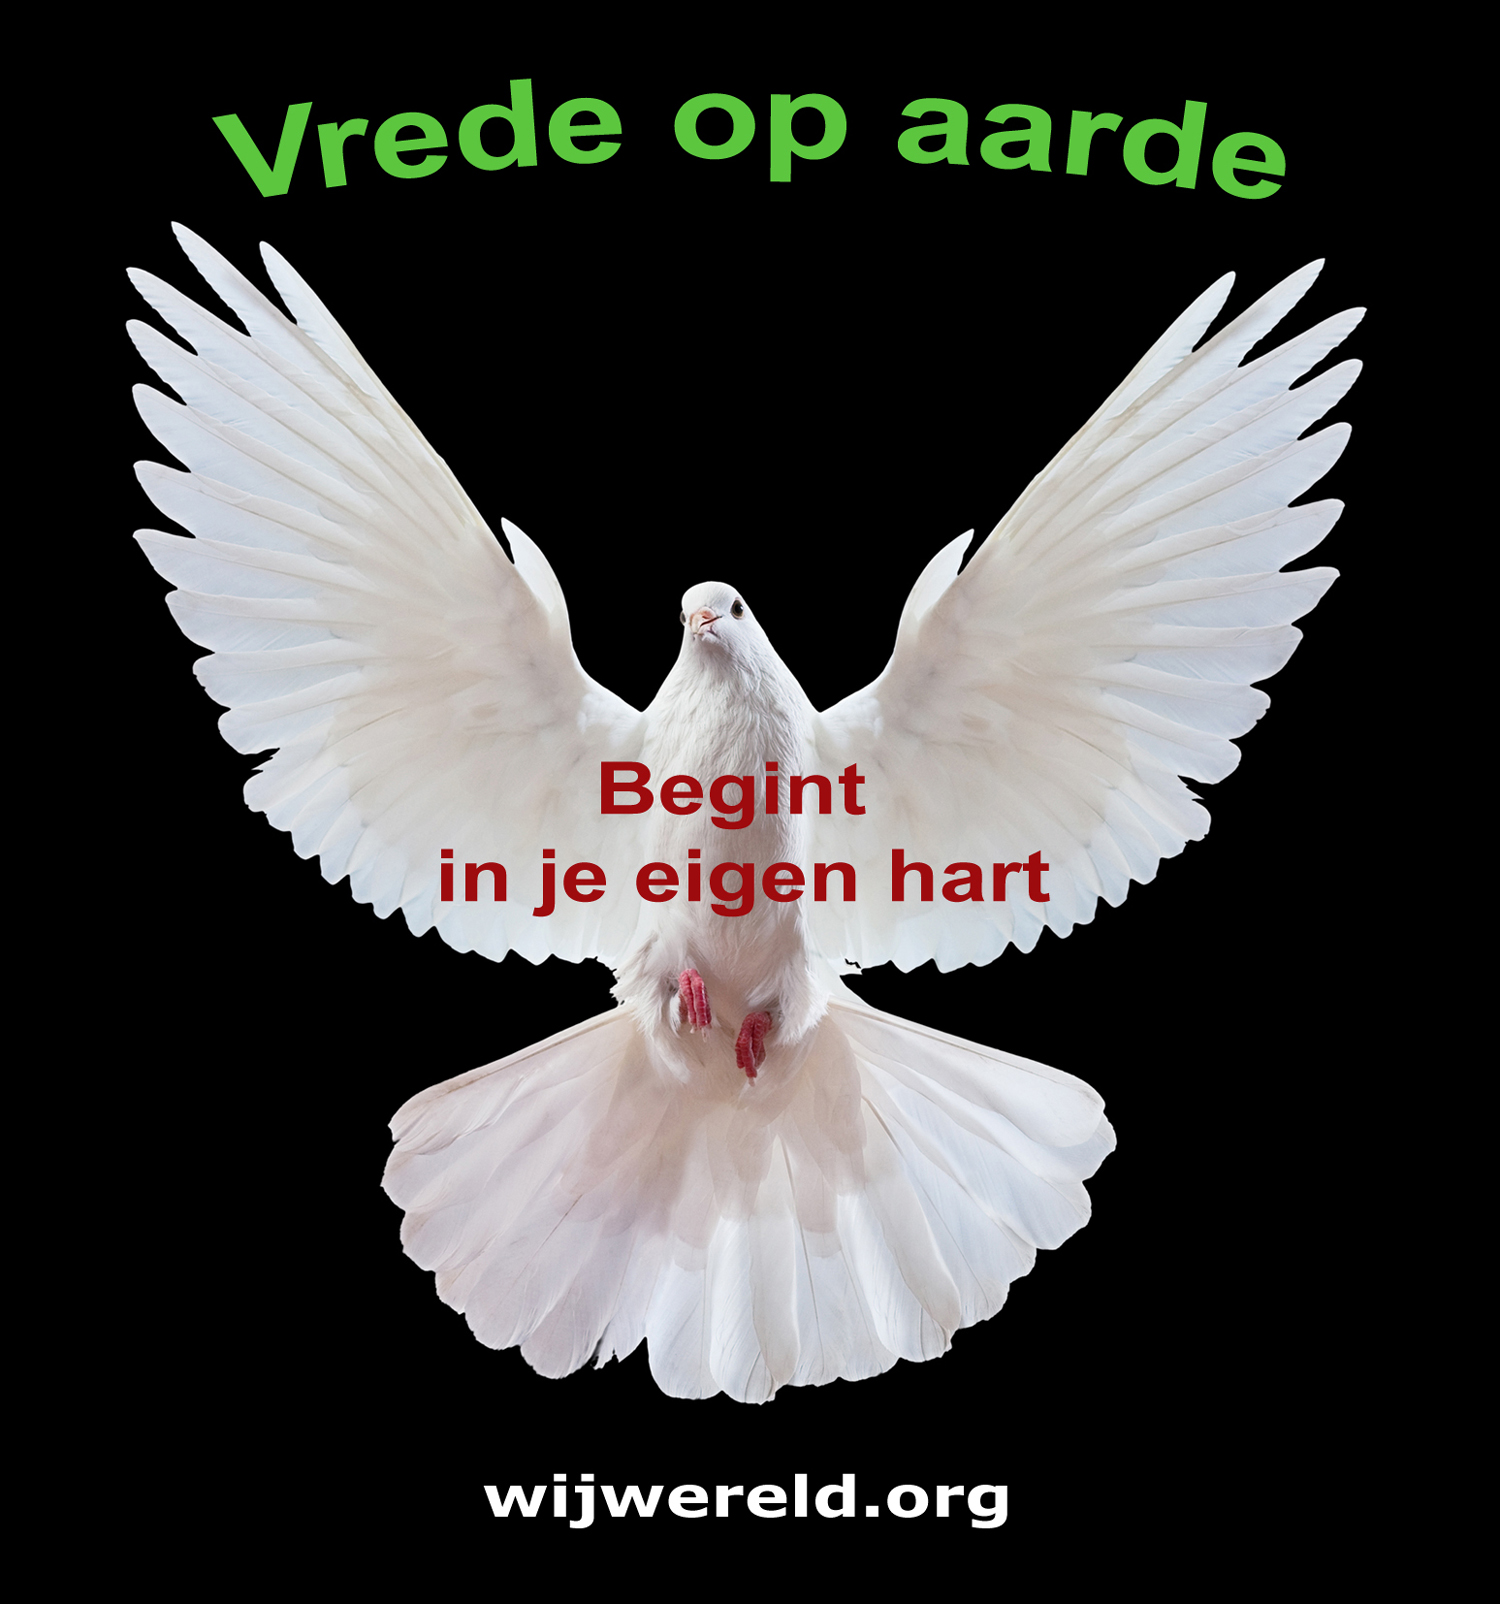 Vrede op aarde begint in je eigen hart